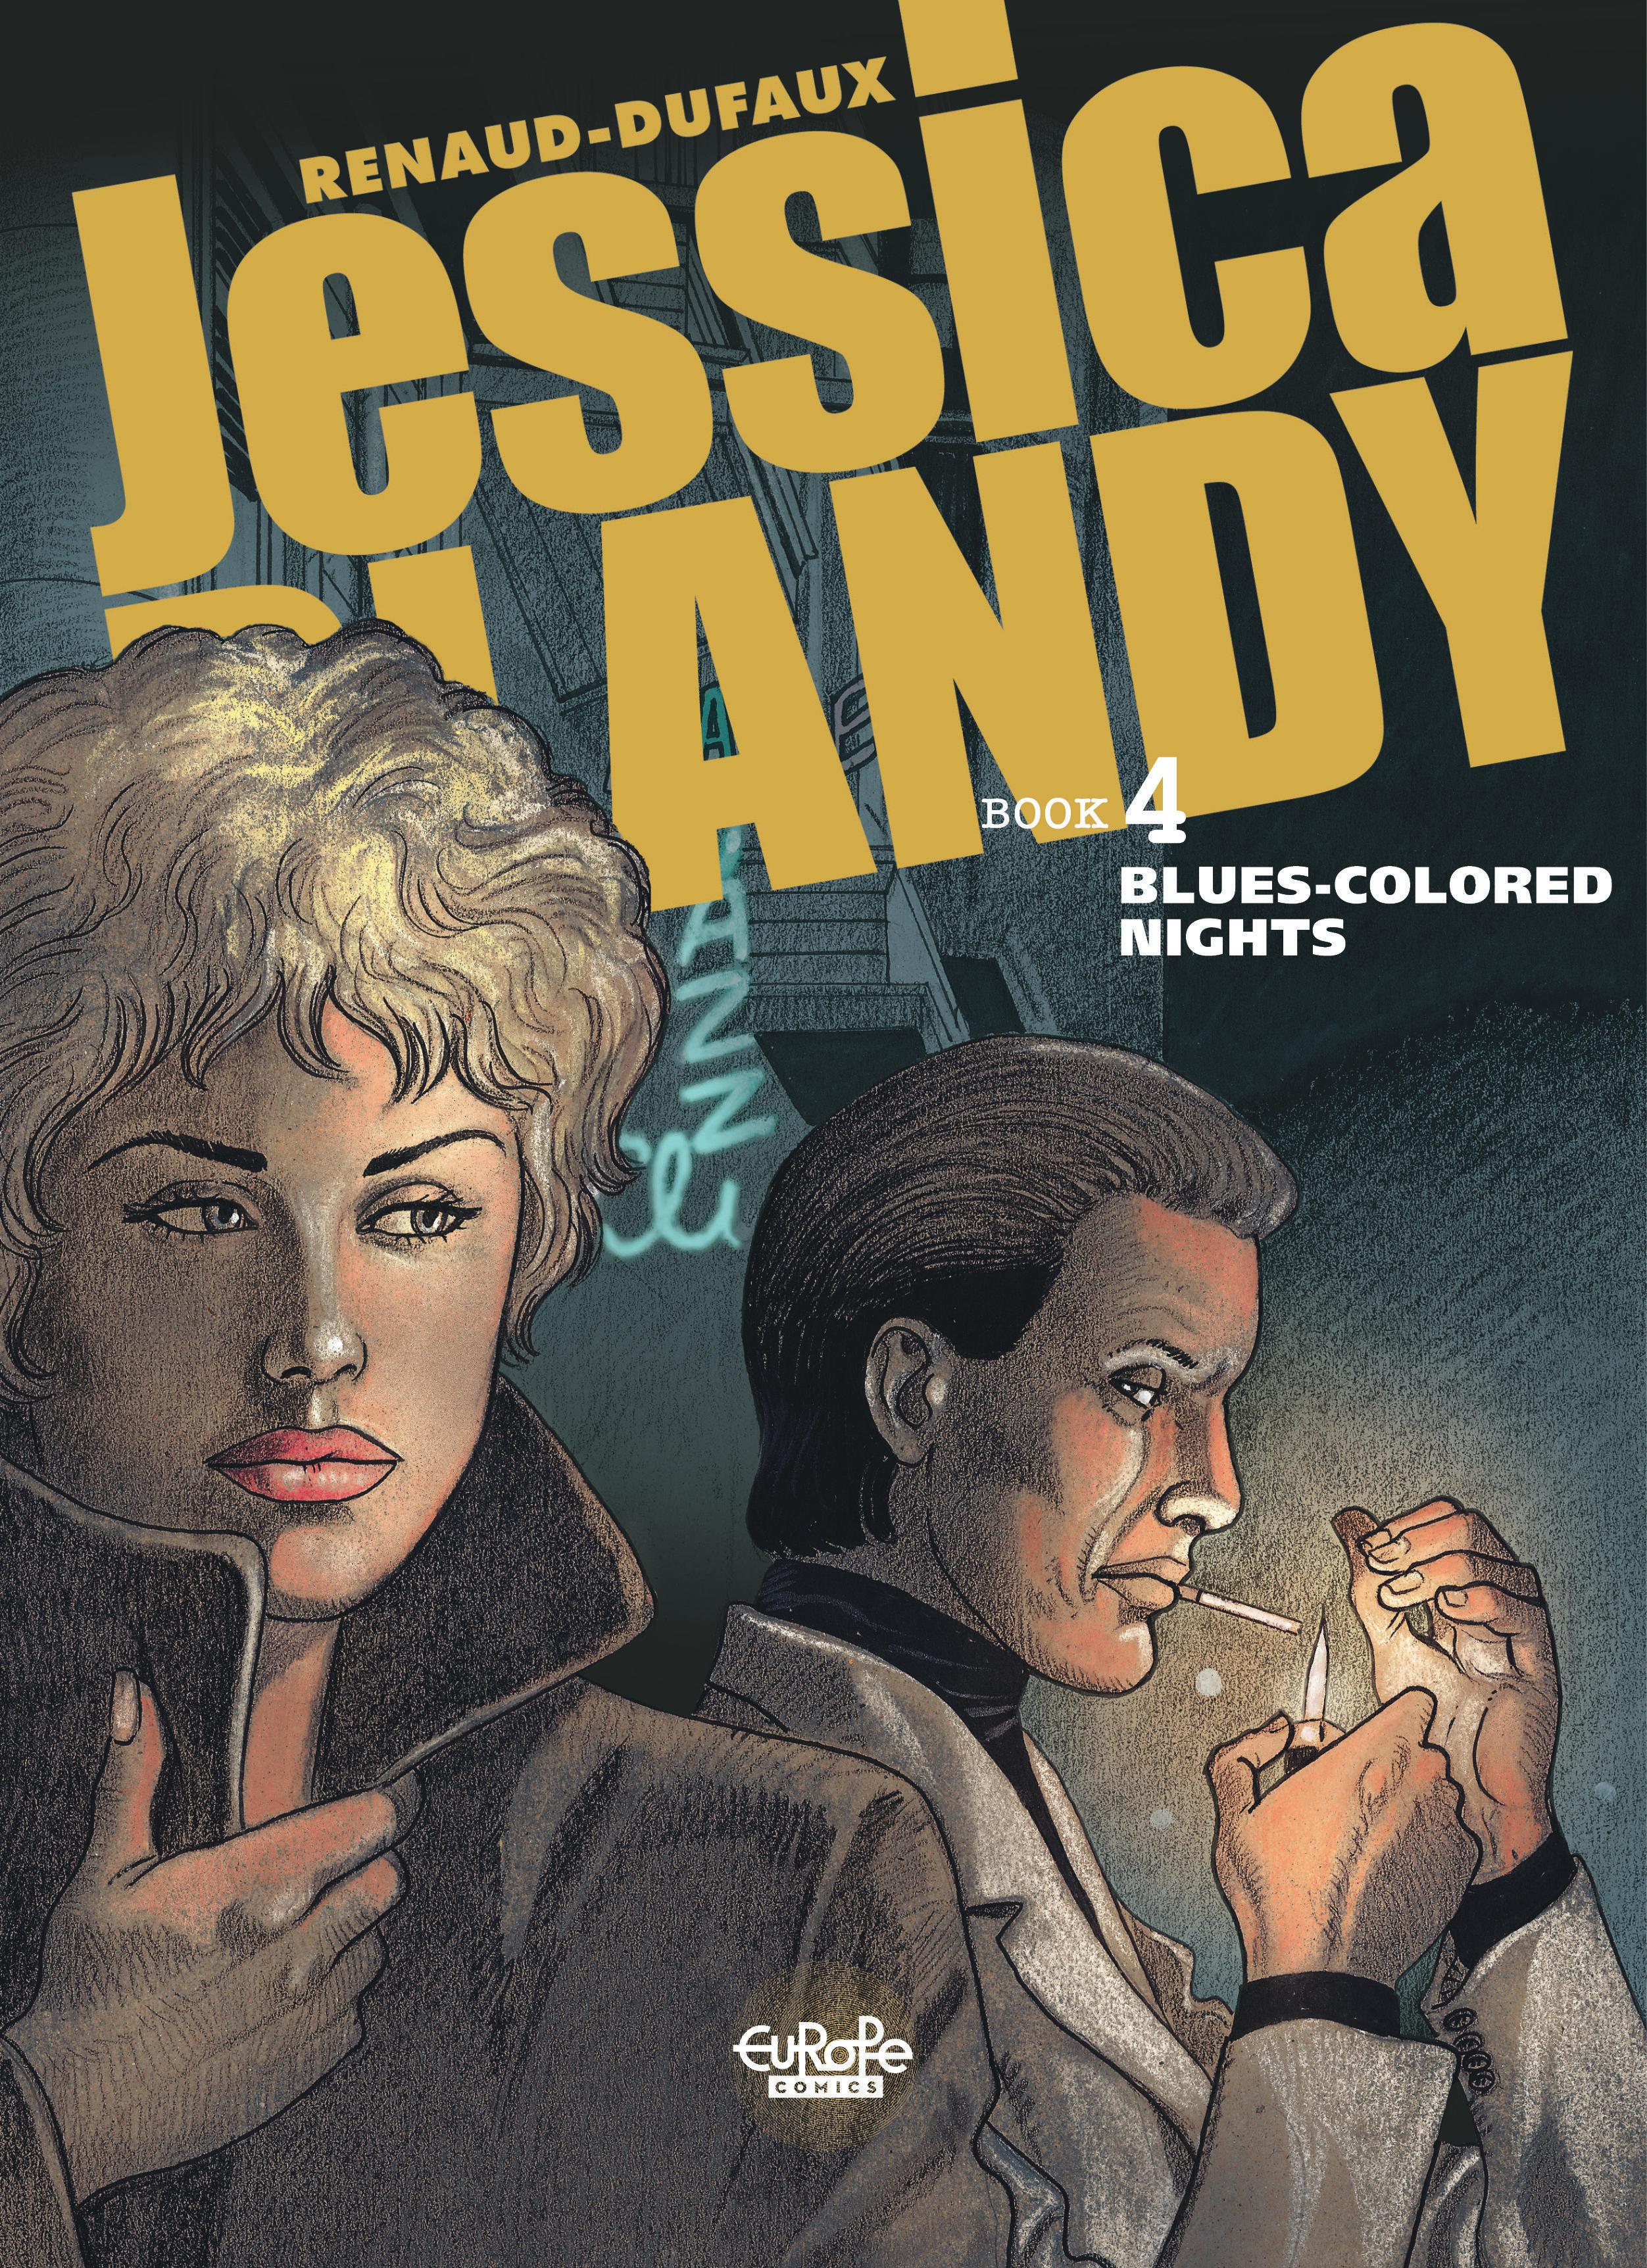 Jessica Blandy - Tome 4 - B...